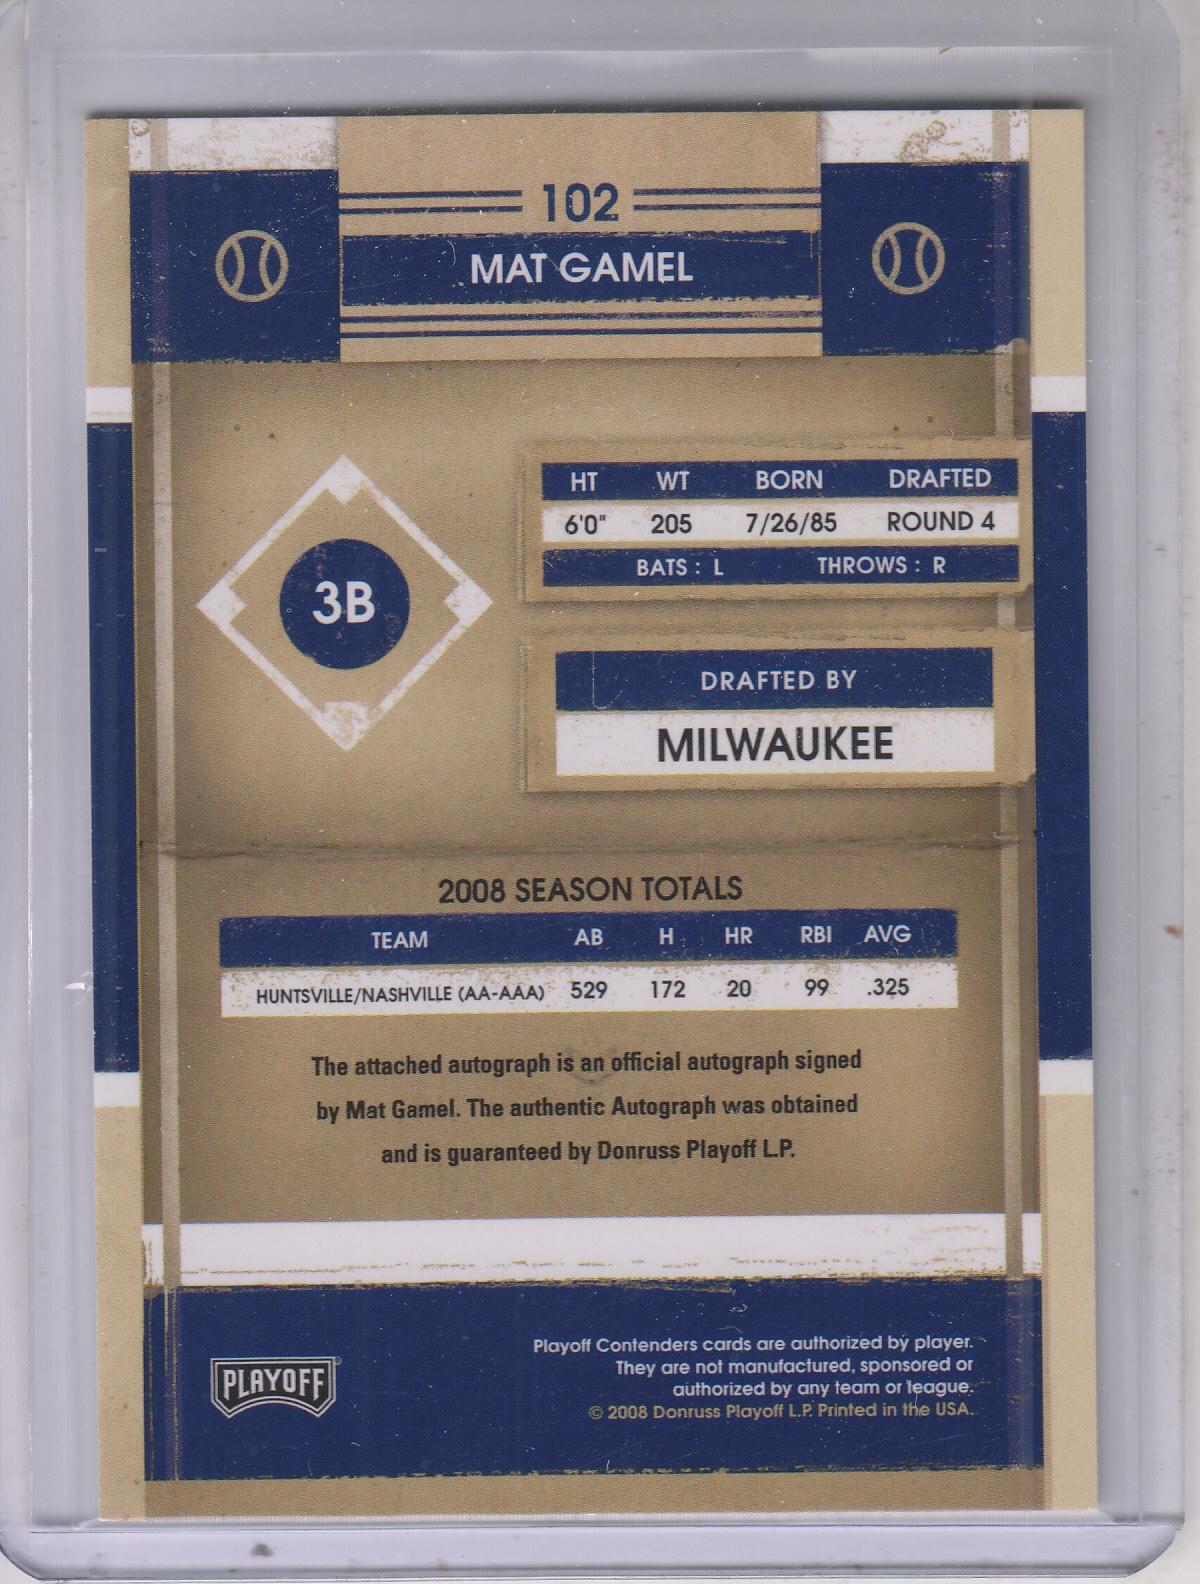 2008 Playoff Contenders #102 Mat Gamel AU back image